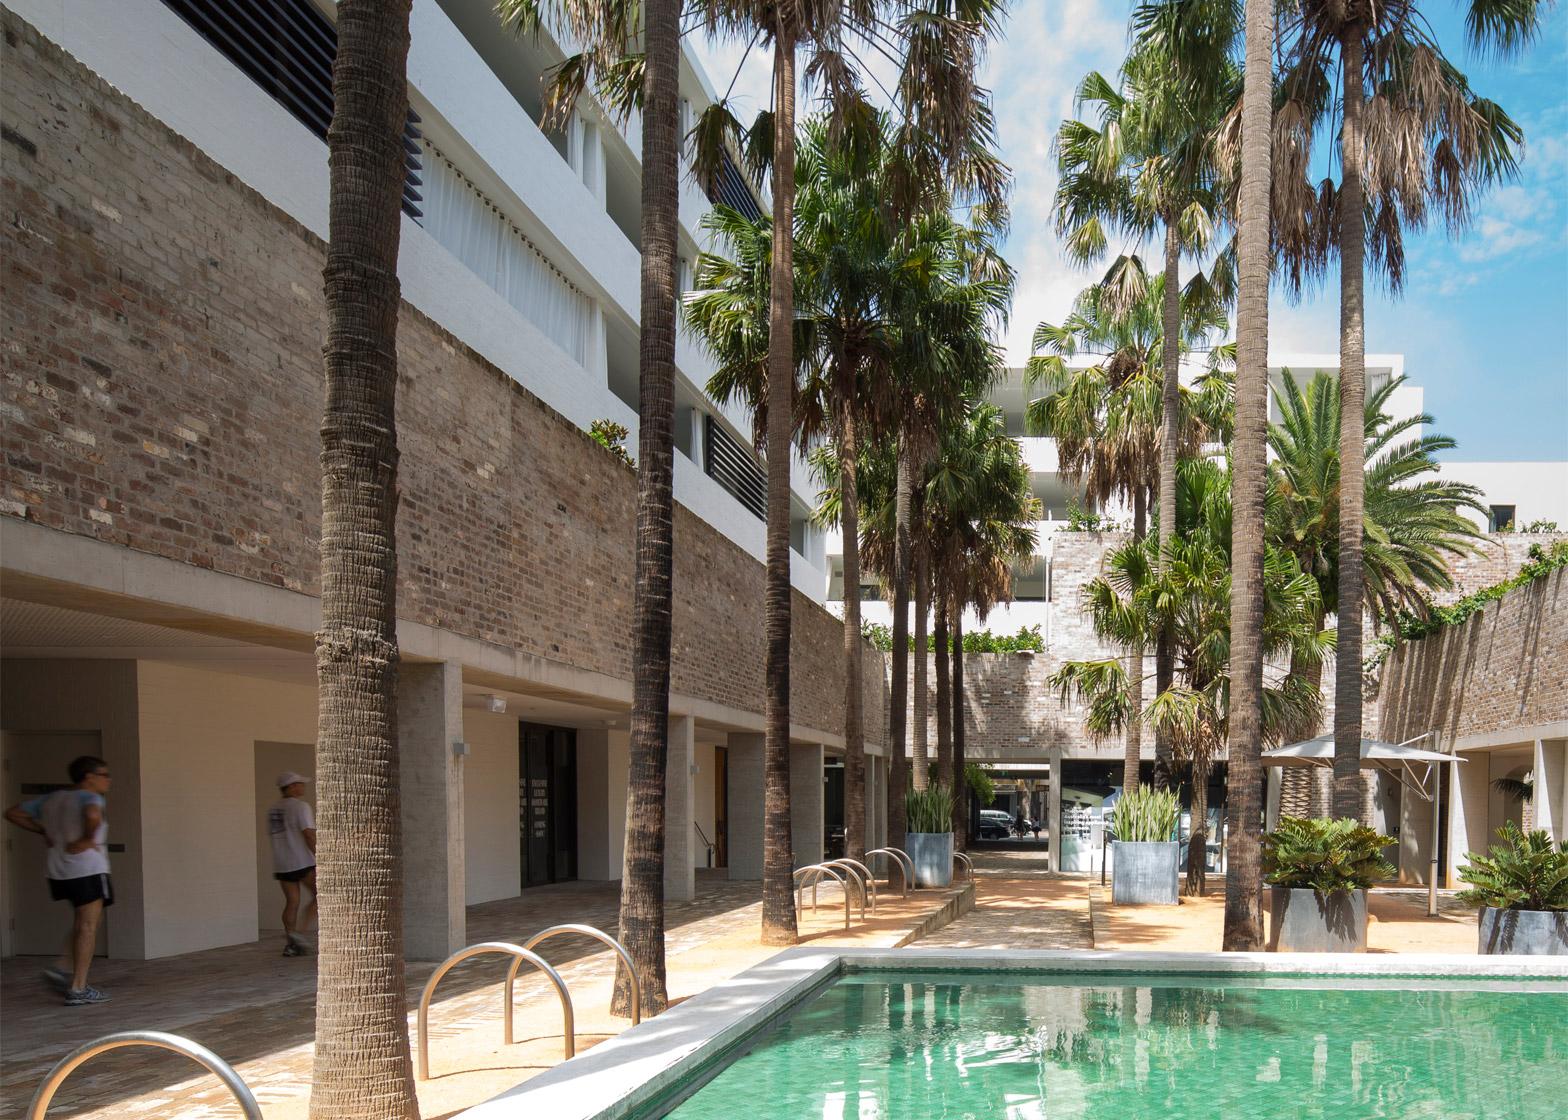 Casba, Australia, by Billard Leece and SJB Architects